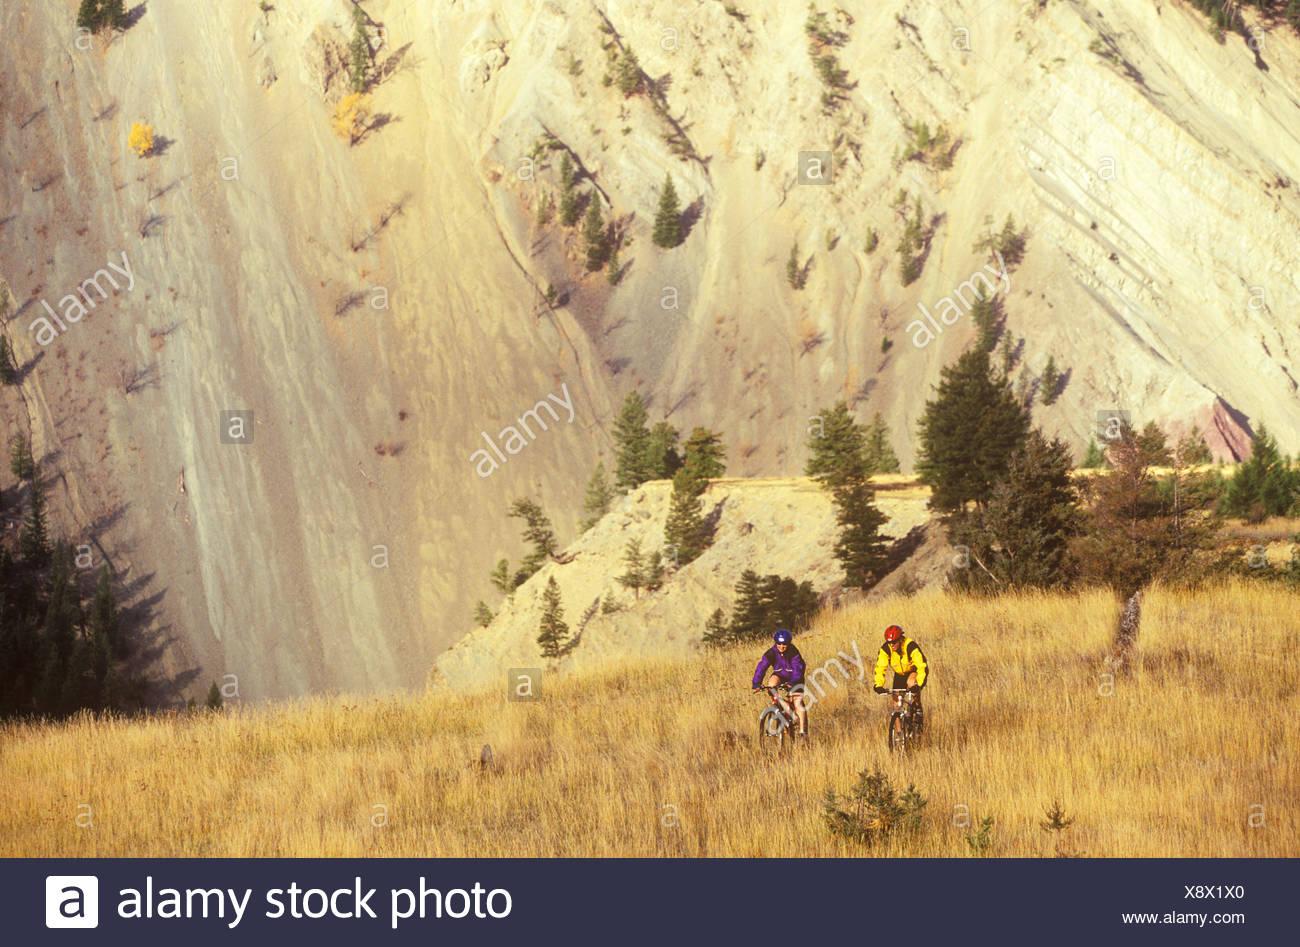 Mountain biking at Wigwam Flats near Fernie, British Columbia, Canada. - Stock Image